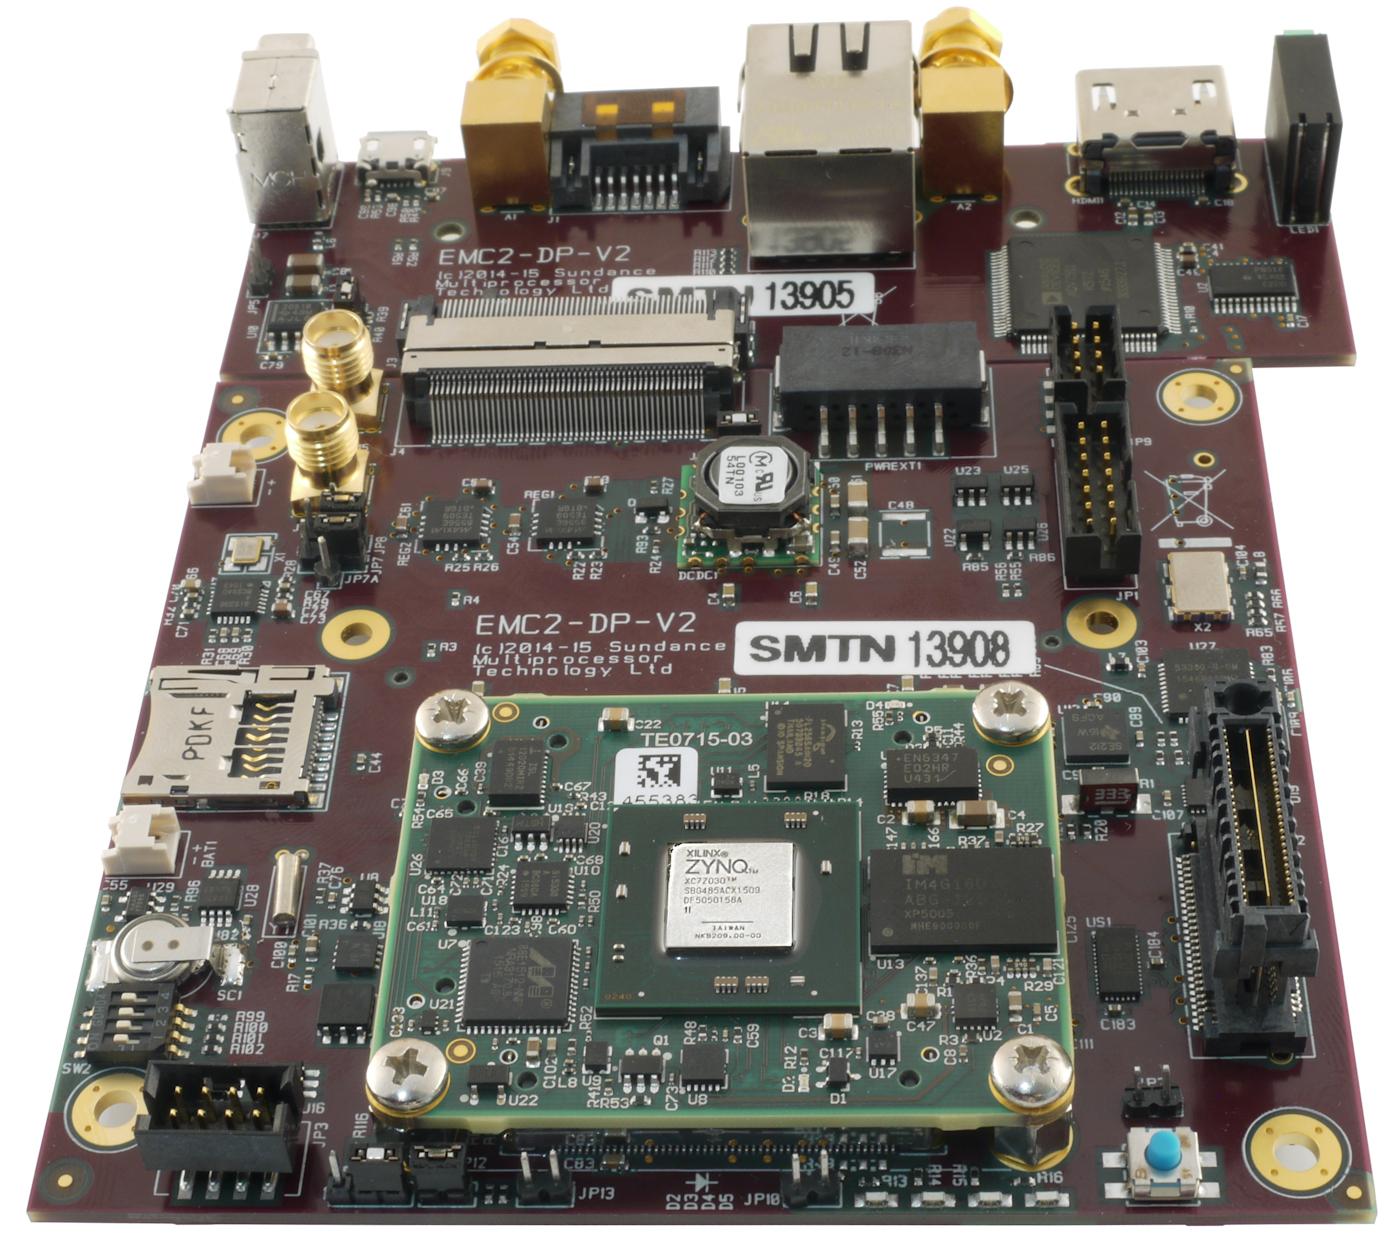 PCIe104 OneBank Board w  Xilinx Zynq Z7030 SoC FPGA